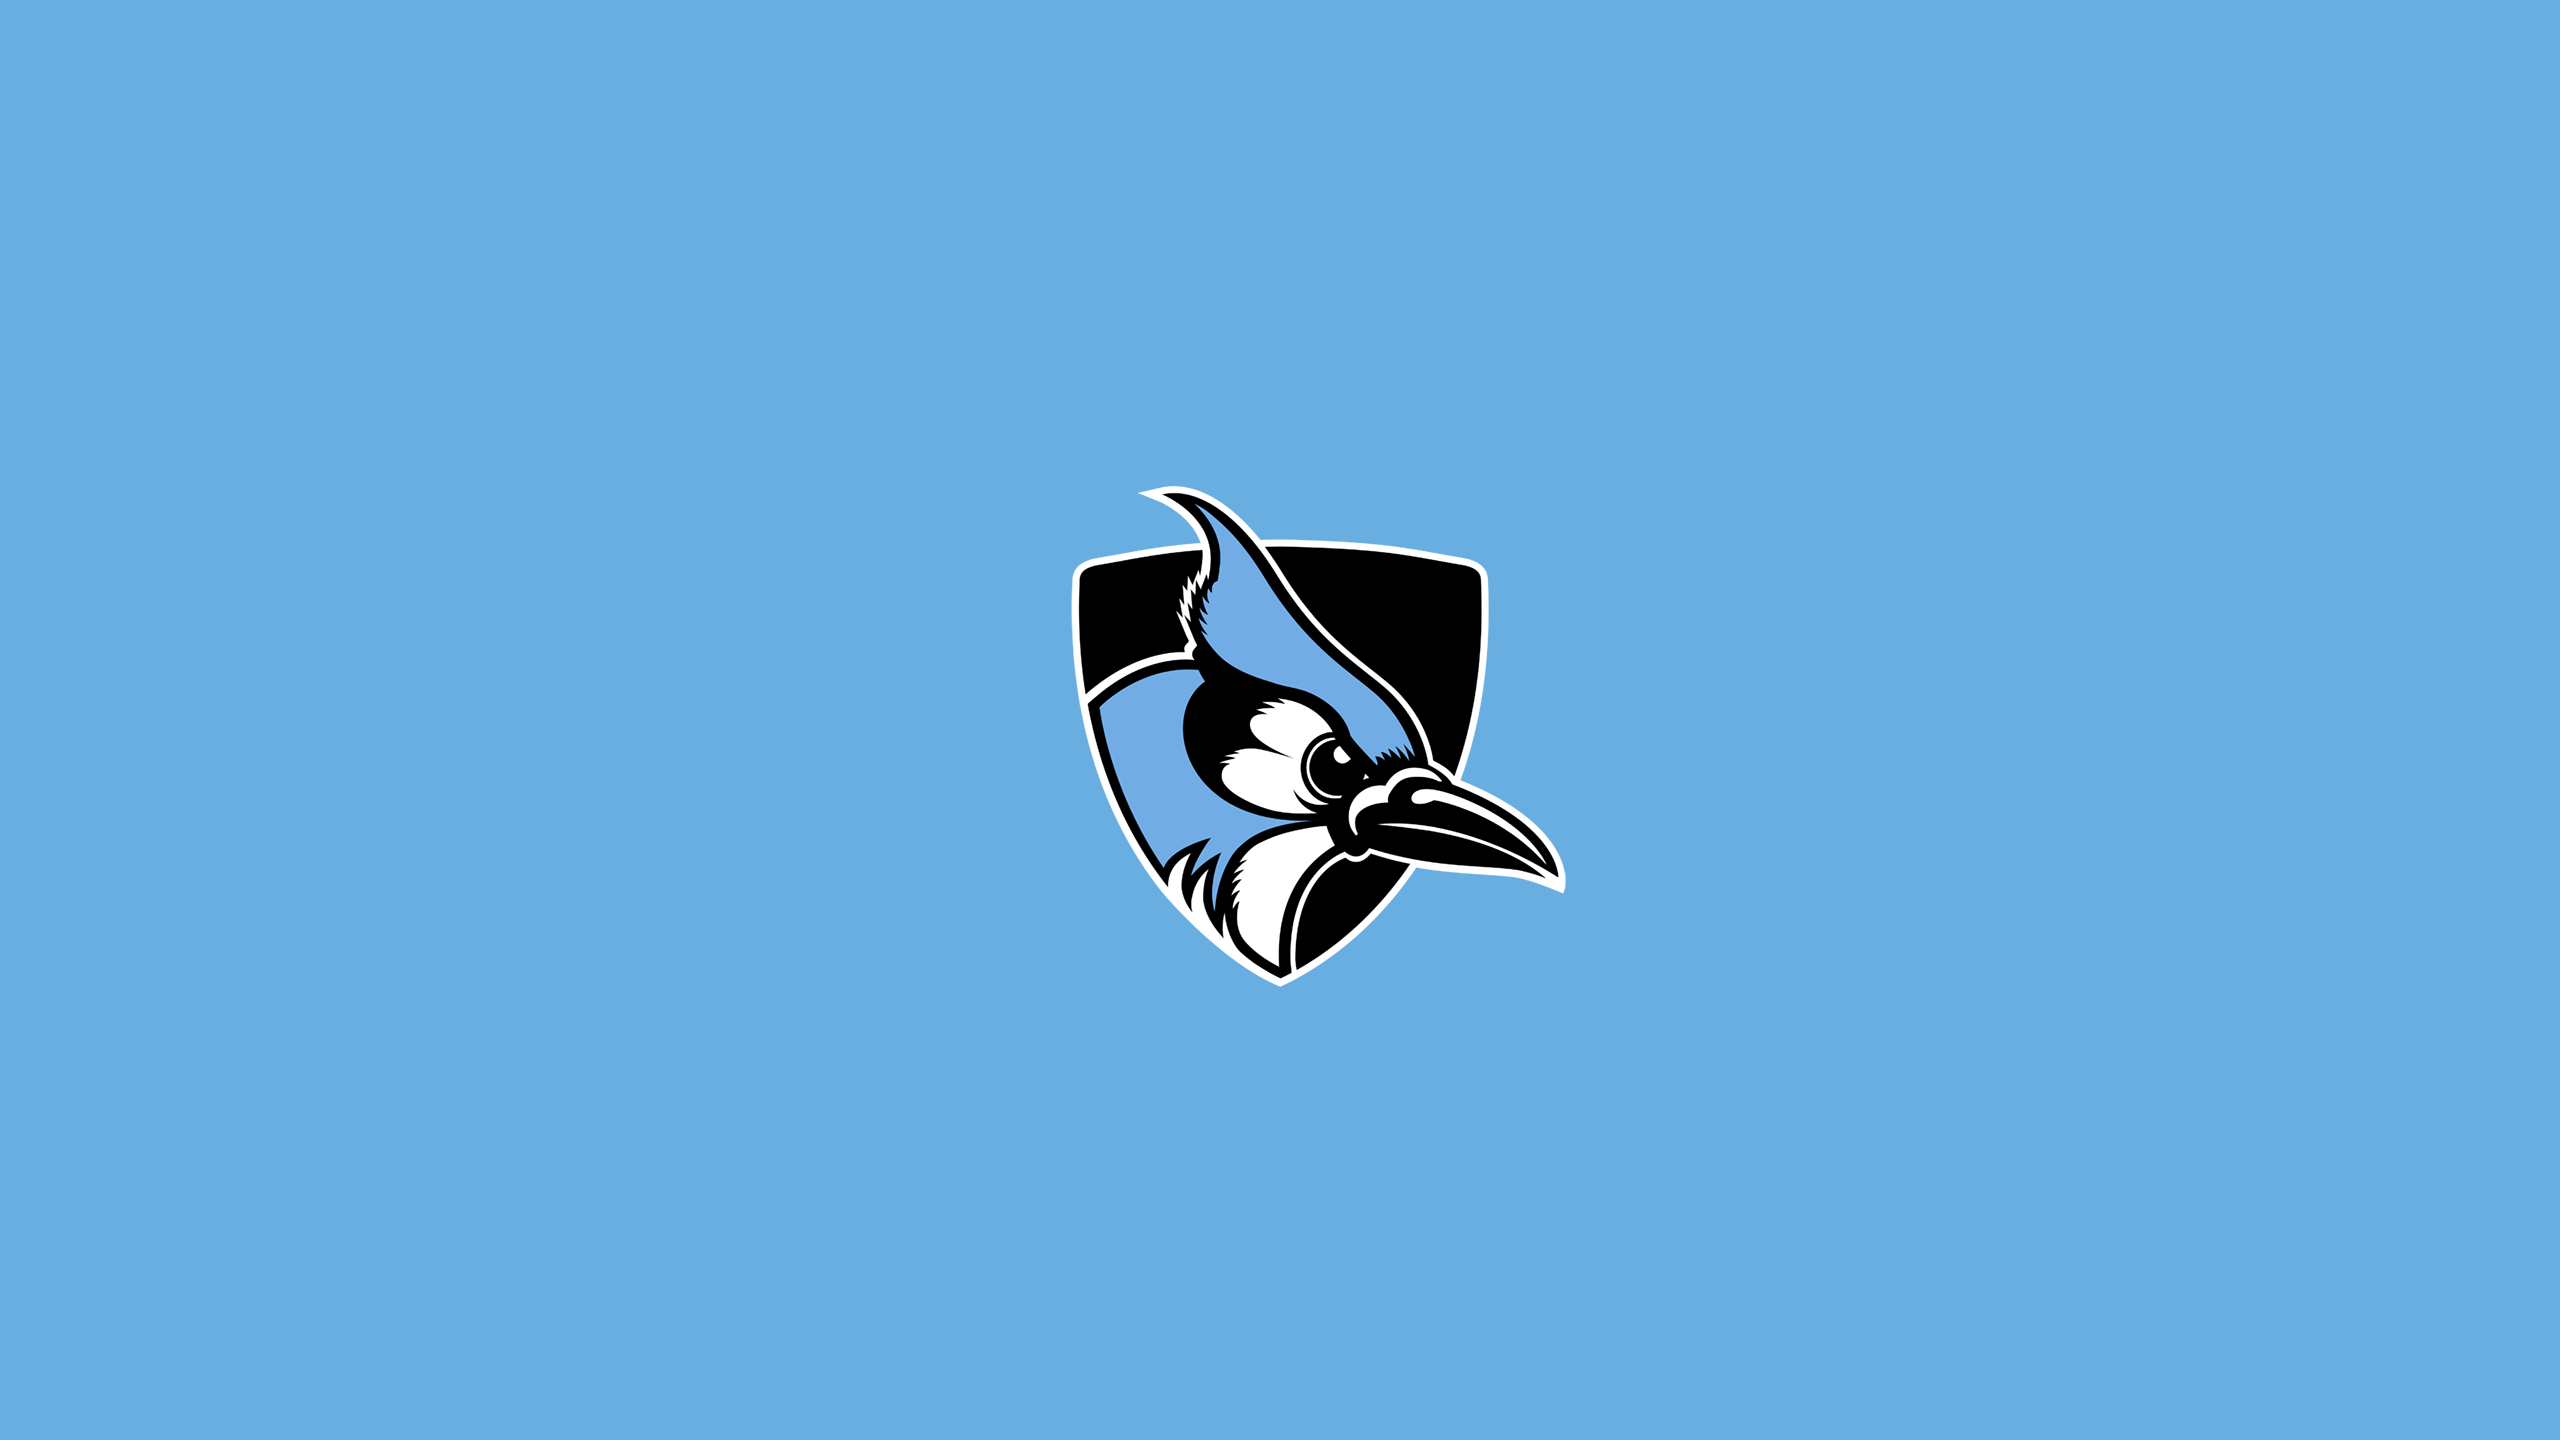 Johns Hopkins University Blue Jays